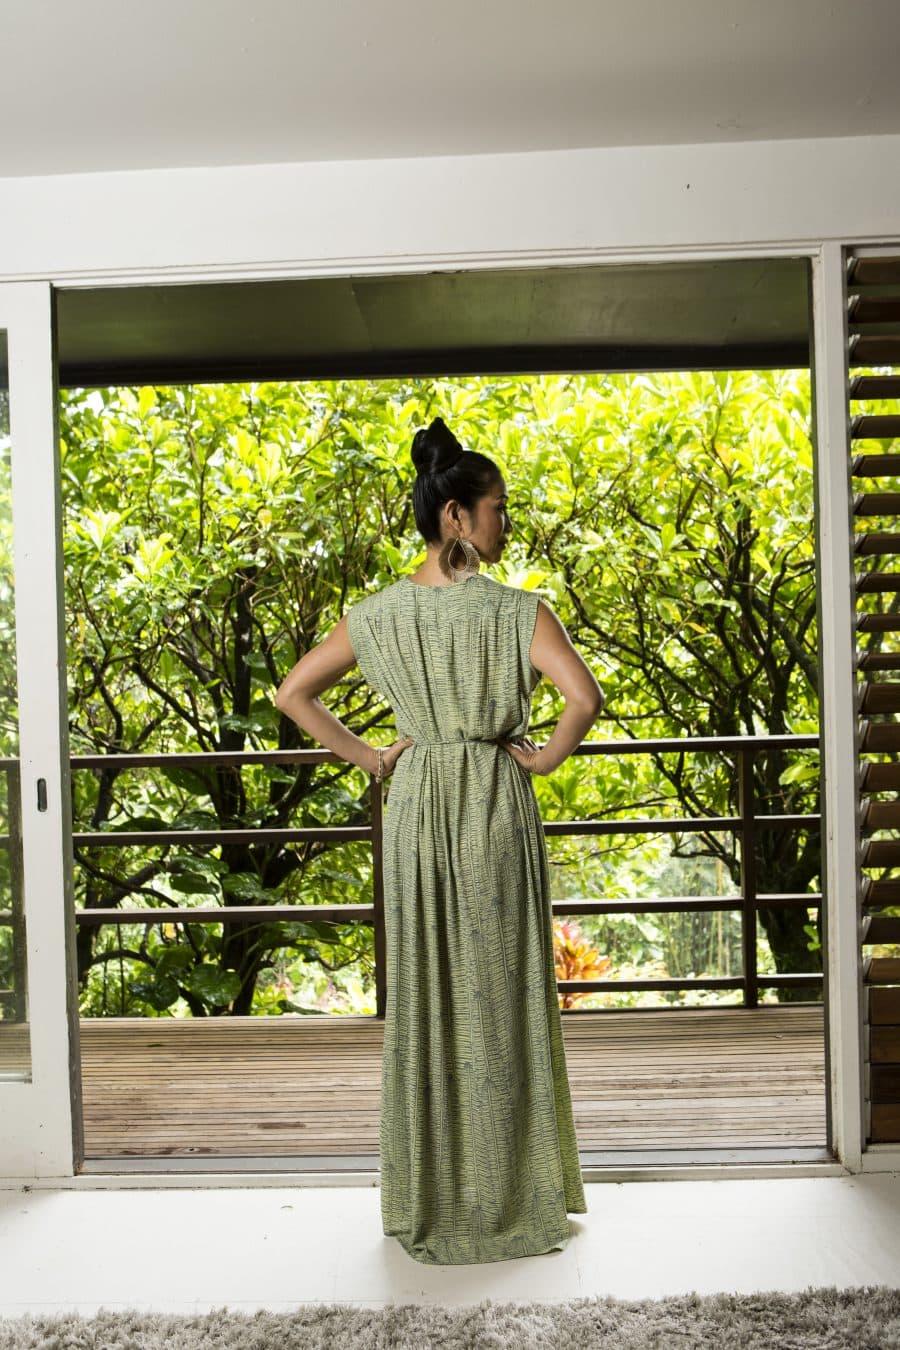 Model wearing Alena Long Dress in Margarita Lily Pad Kupukupu Pattern back view